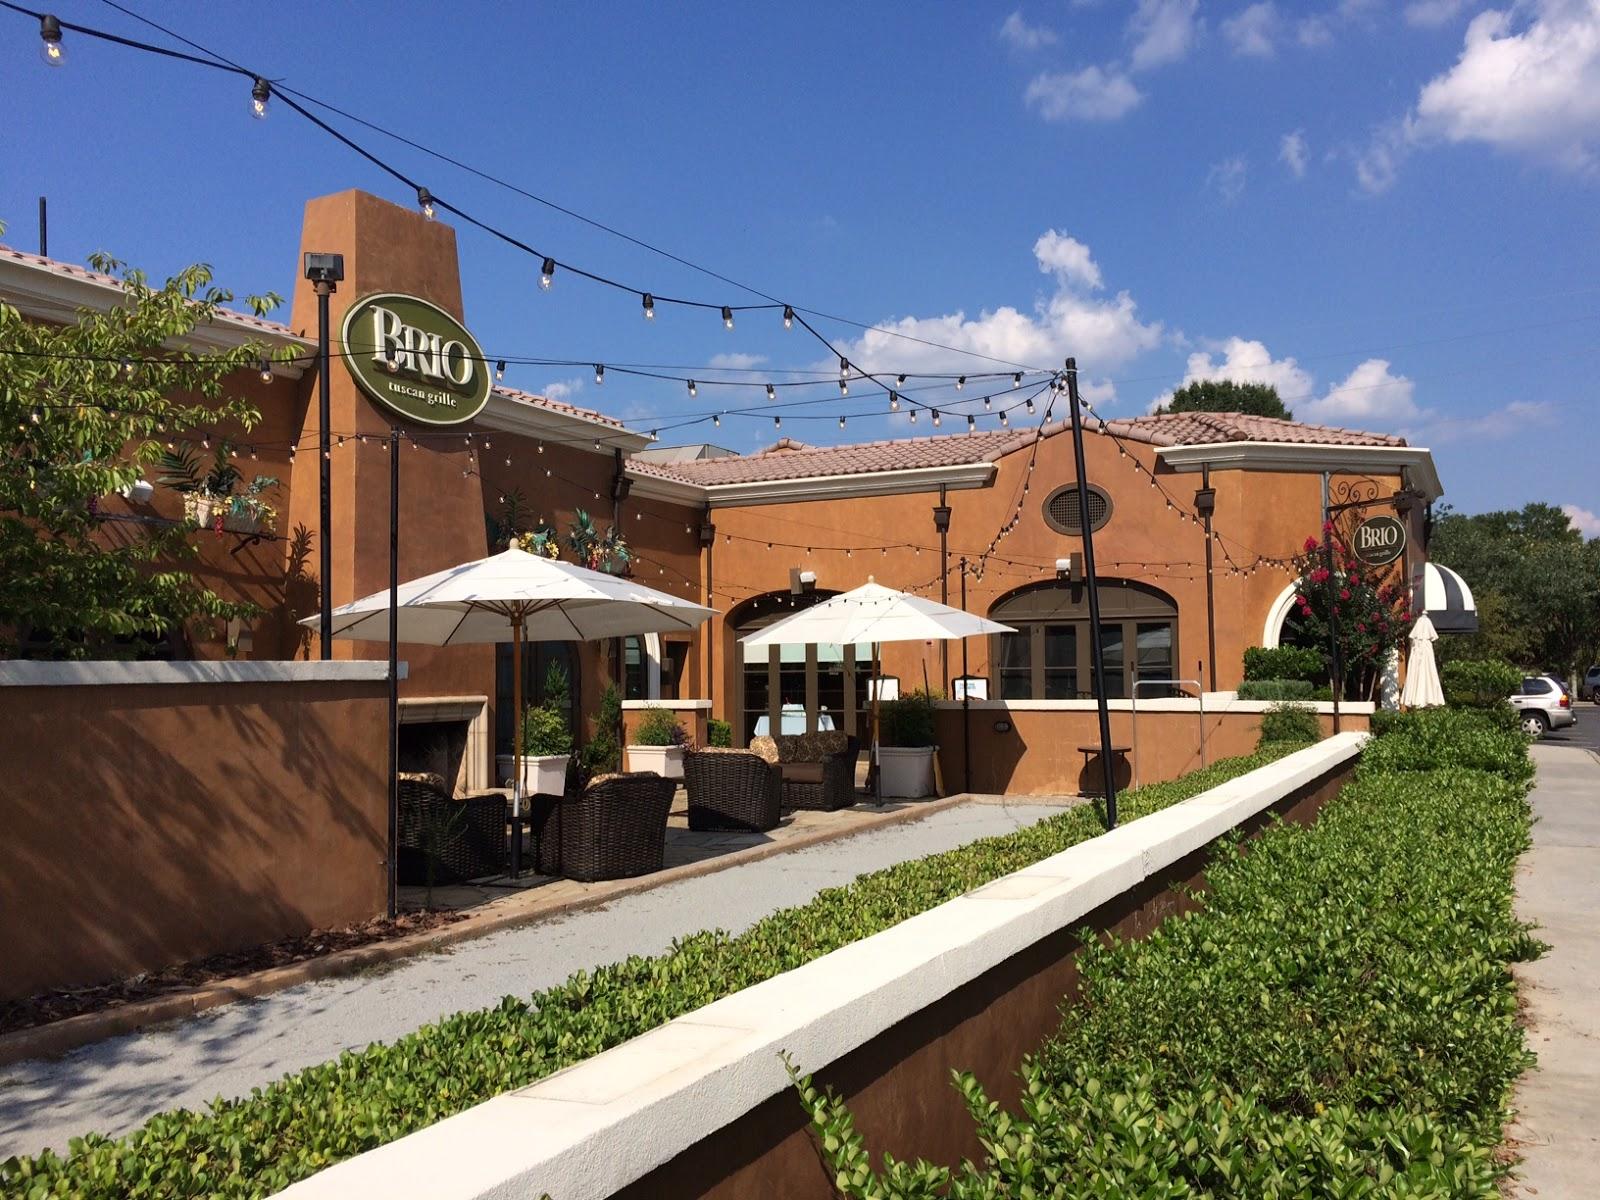 Tomorrows News Today Atlanta Brio Tuscan Grille To Bid Ciao To